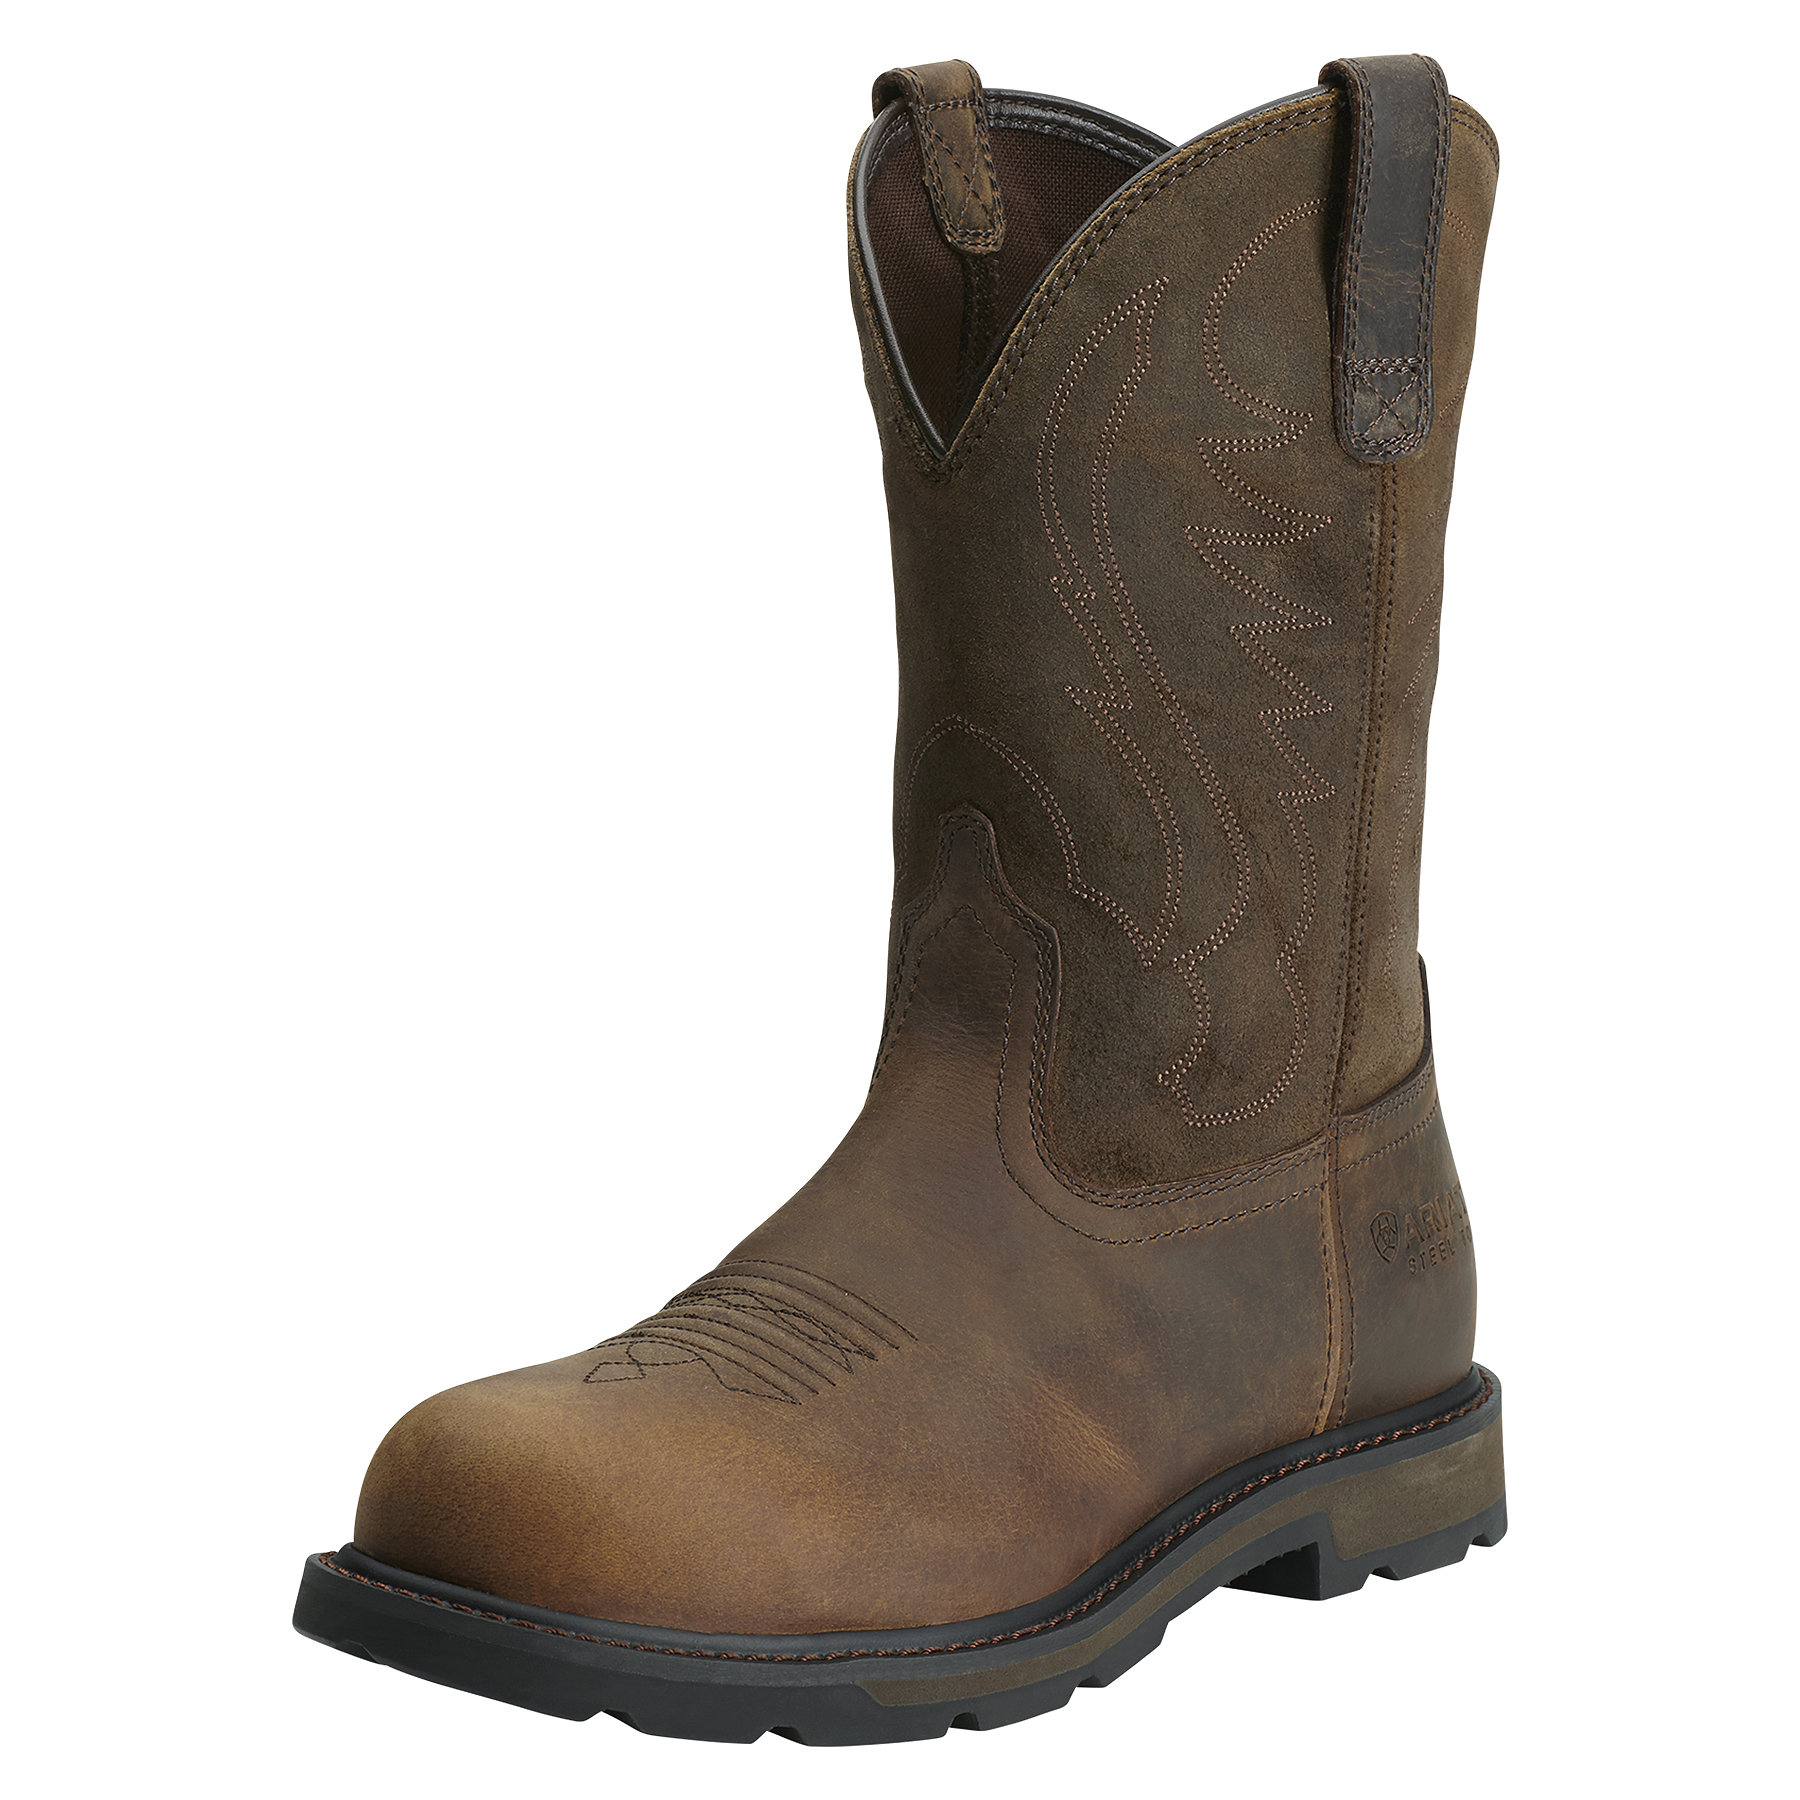 Steel Toe Work Boot - Walmart